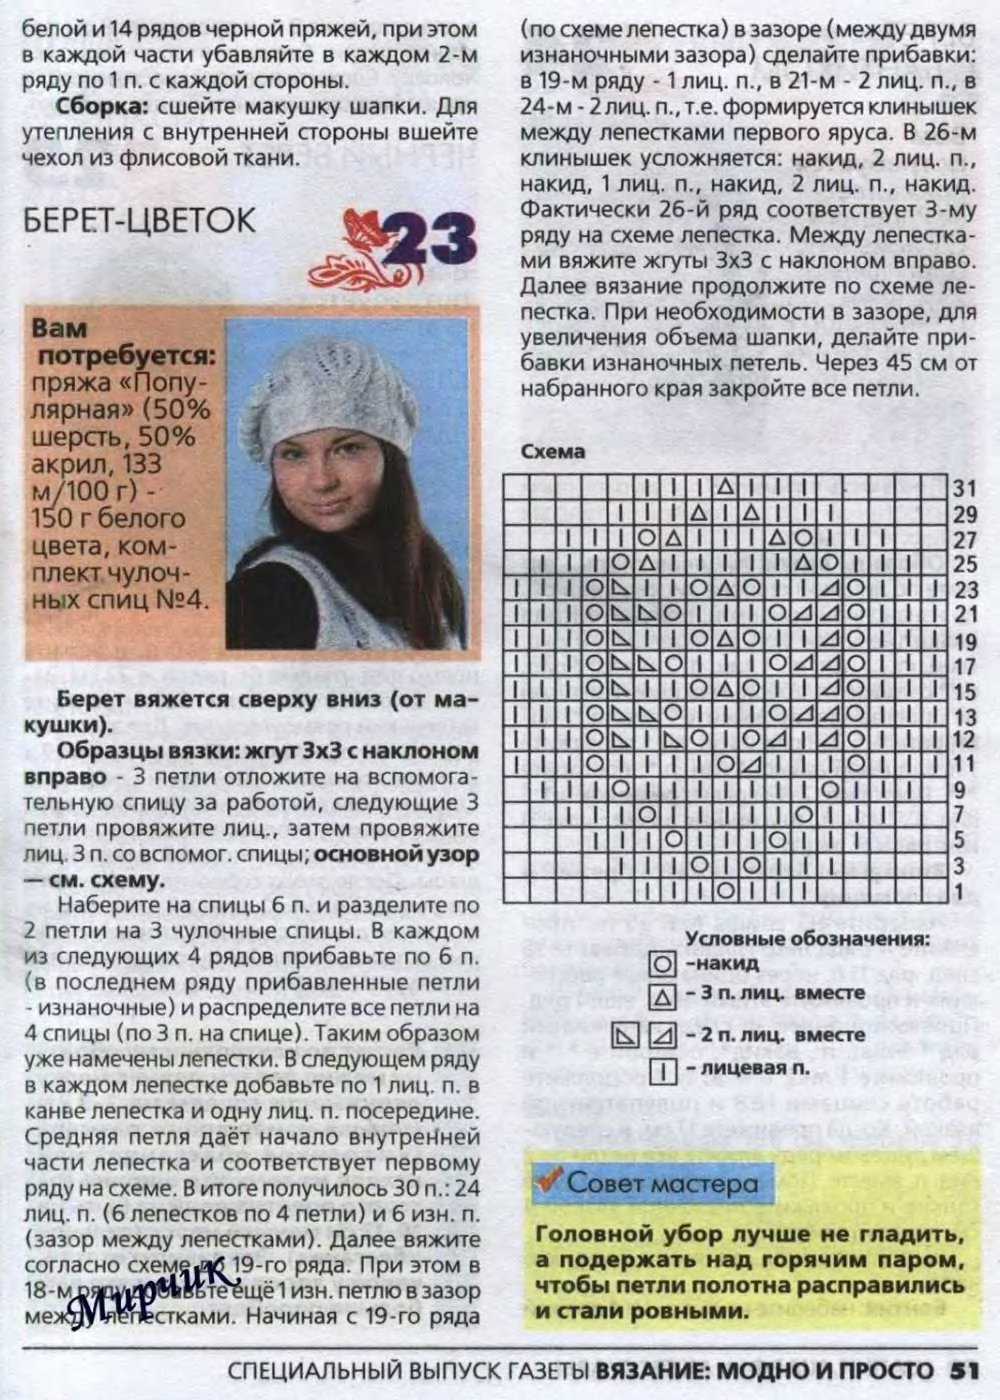 Вязание шапки-кубанки спицами описание